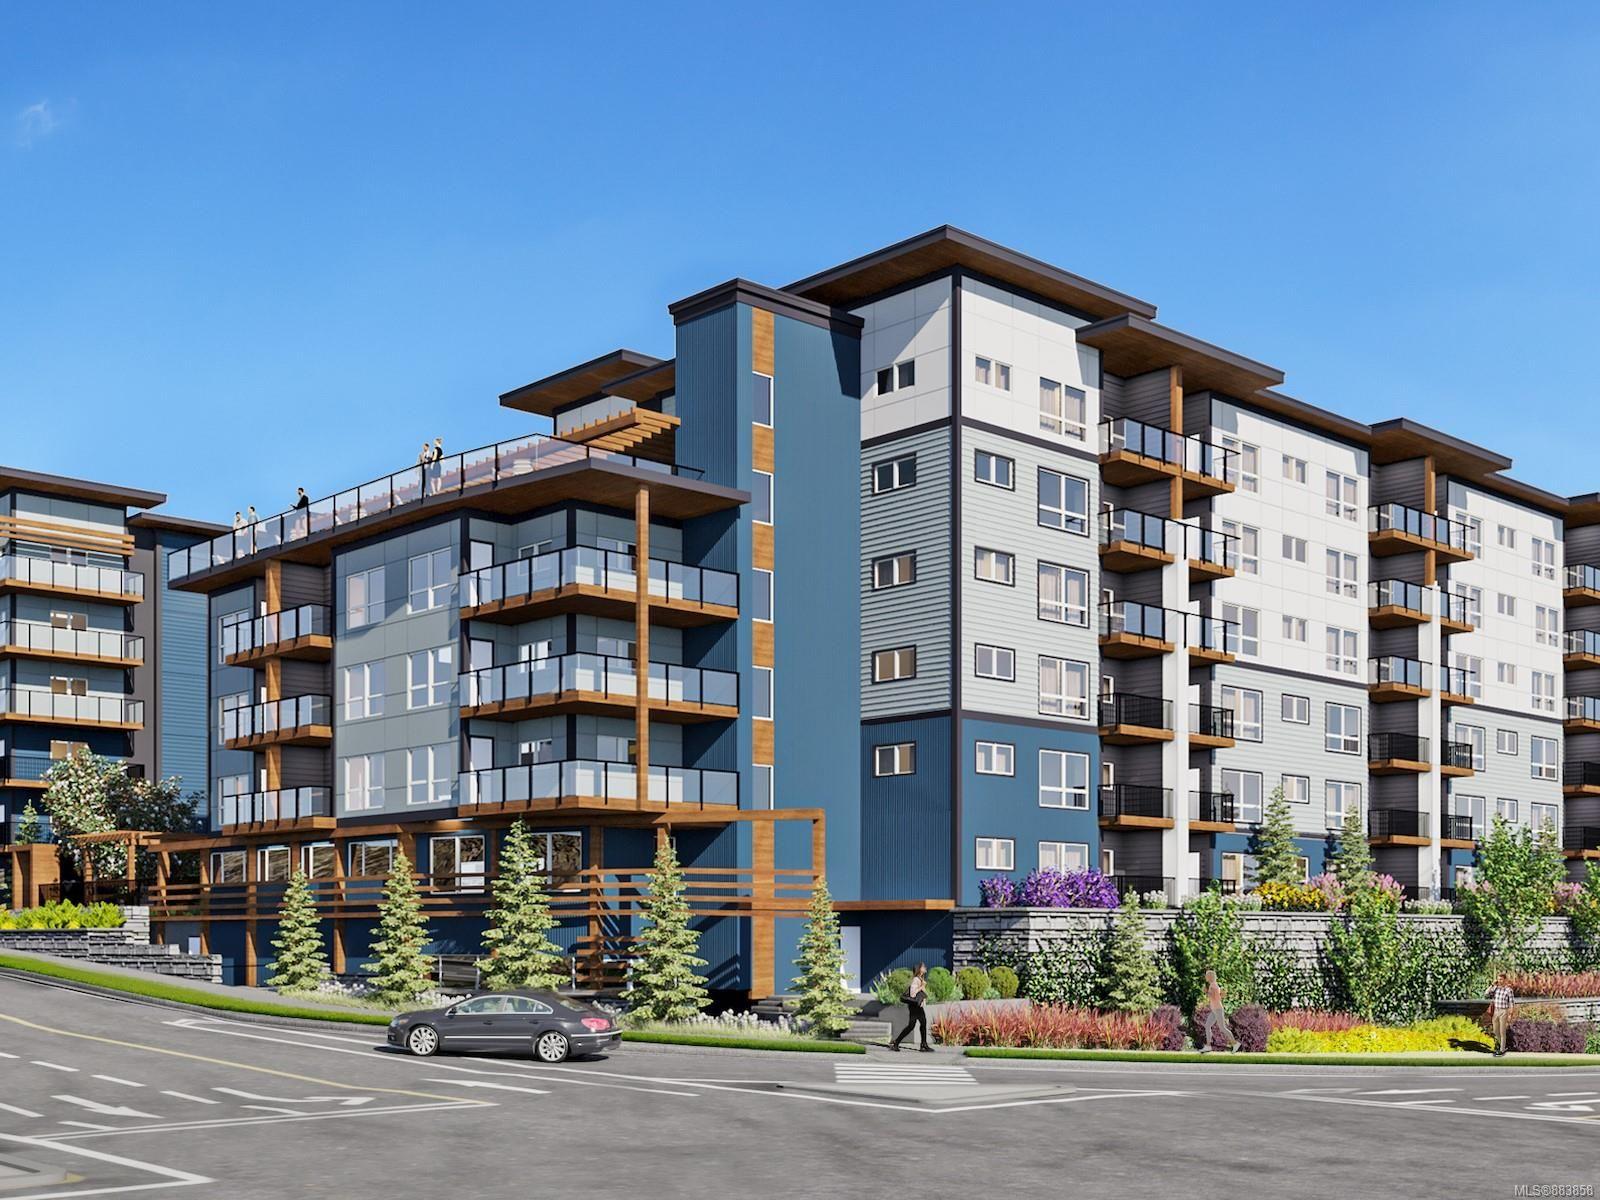 Main Photo: 107B 2465 Gateway Rd in : La Florence Lake Condo for sale (Langford)  : MLS®# 883858